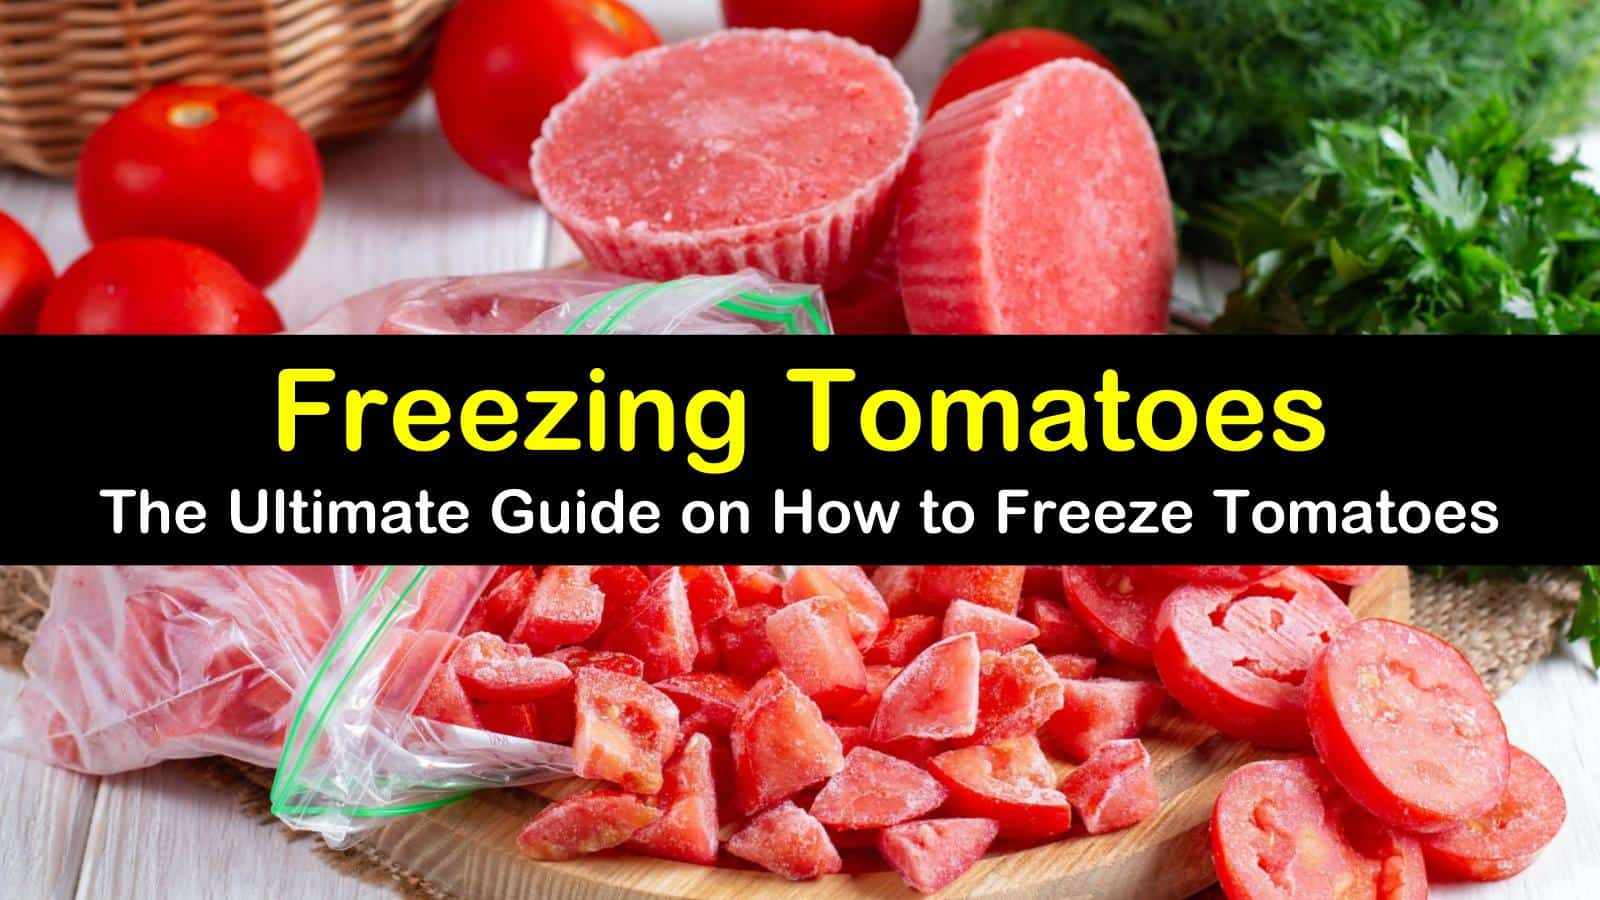 6 Brilliant Ways To Freeze Tomatoes